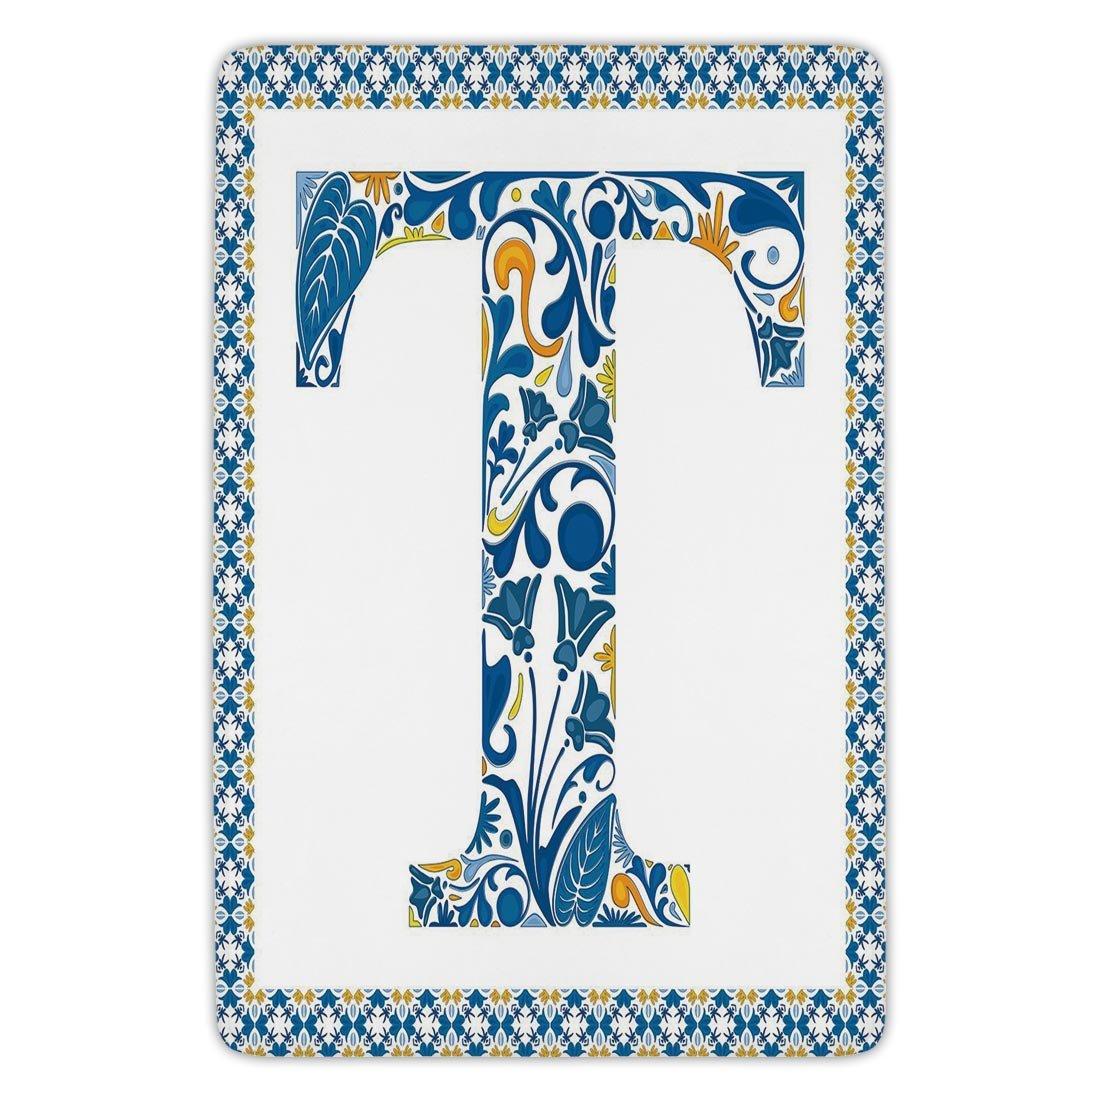 Amazon.com: Bathroom Bath Rug Kitchen Floor Mat Carpet,Letter T ...